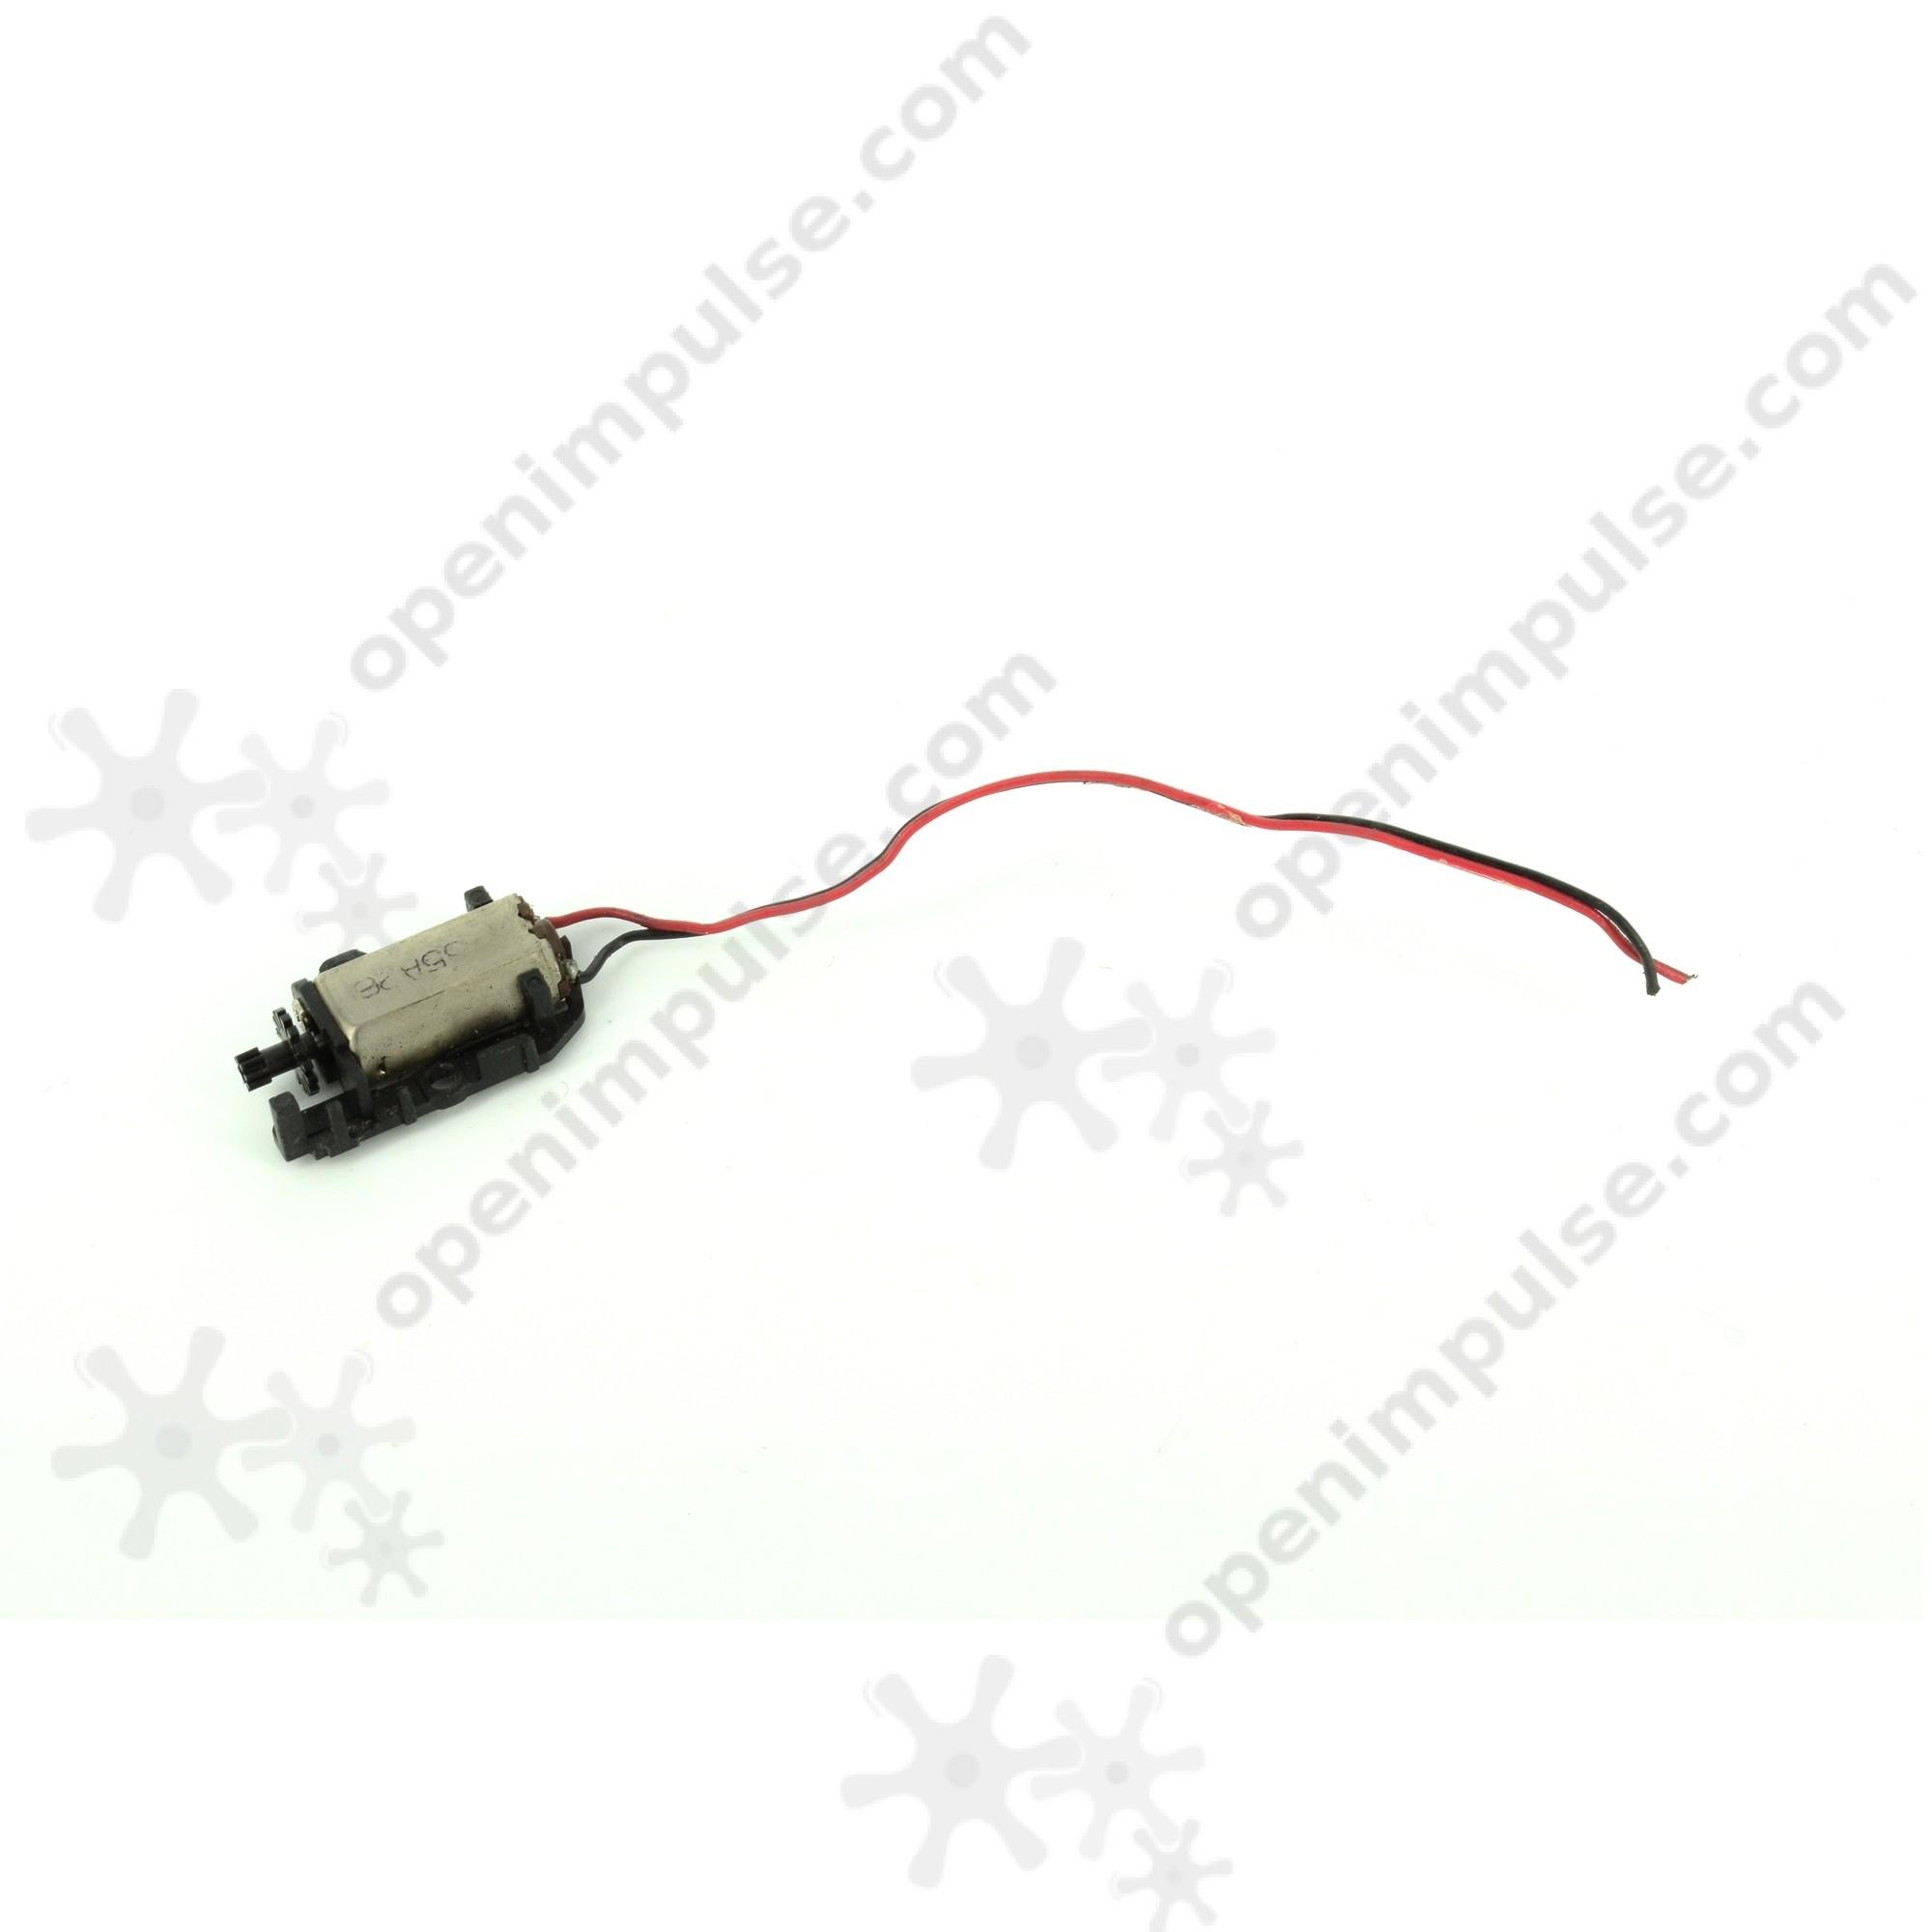 5pcs ka15 motor with gear